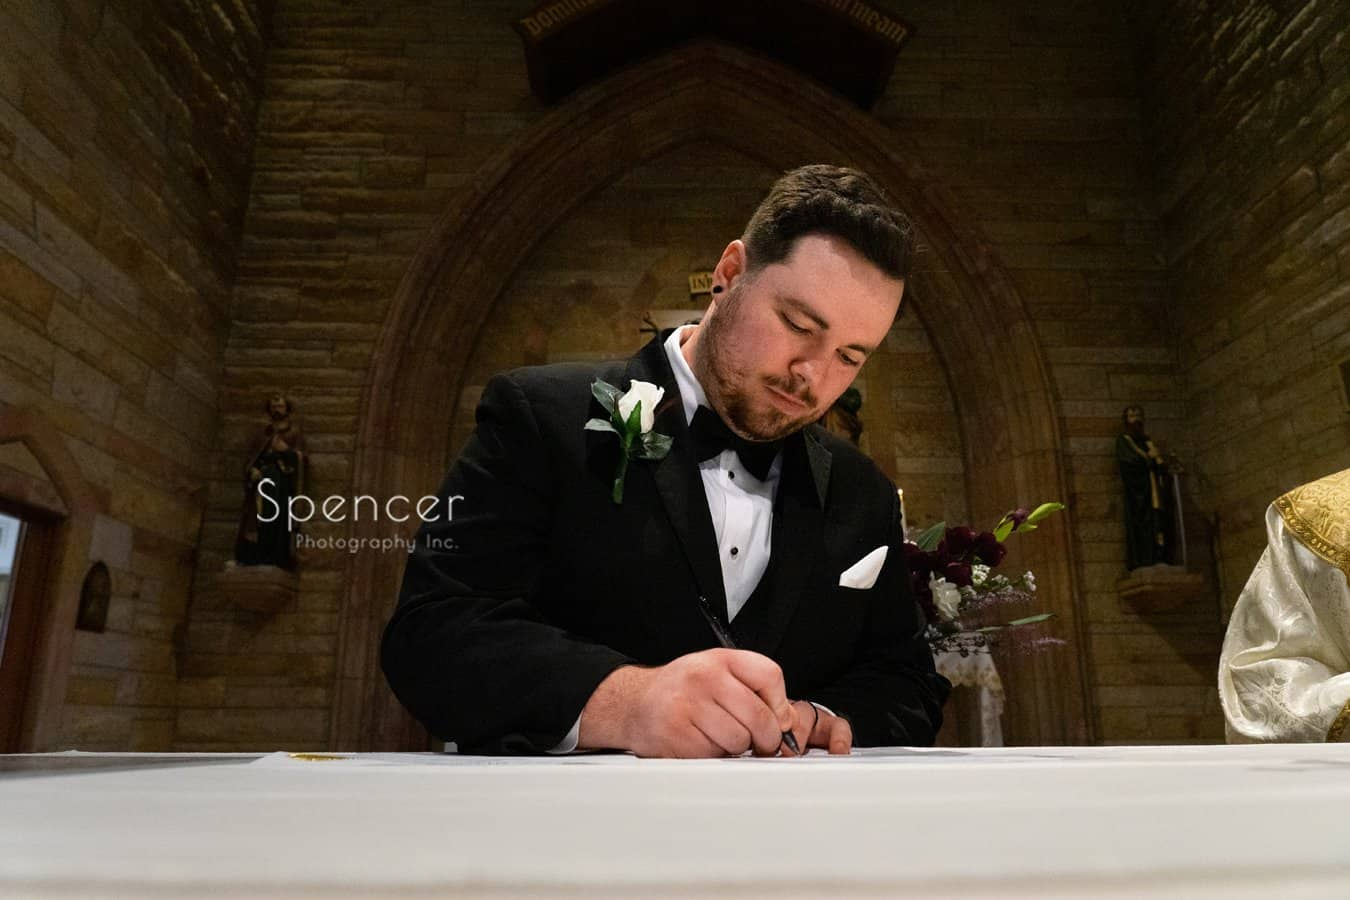 groom signing Indiana wedding license